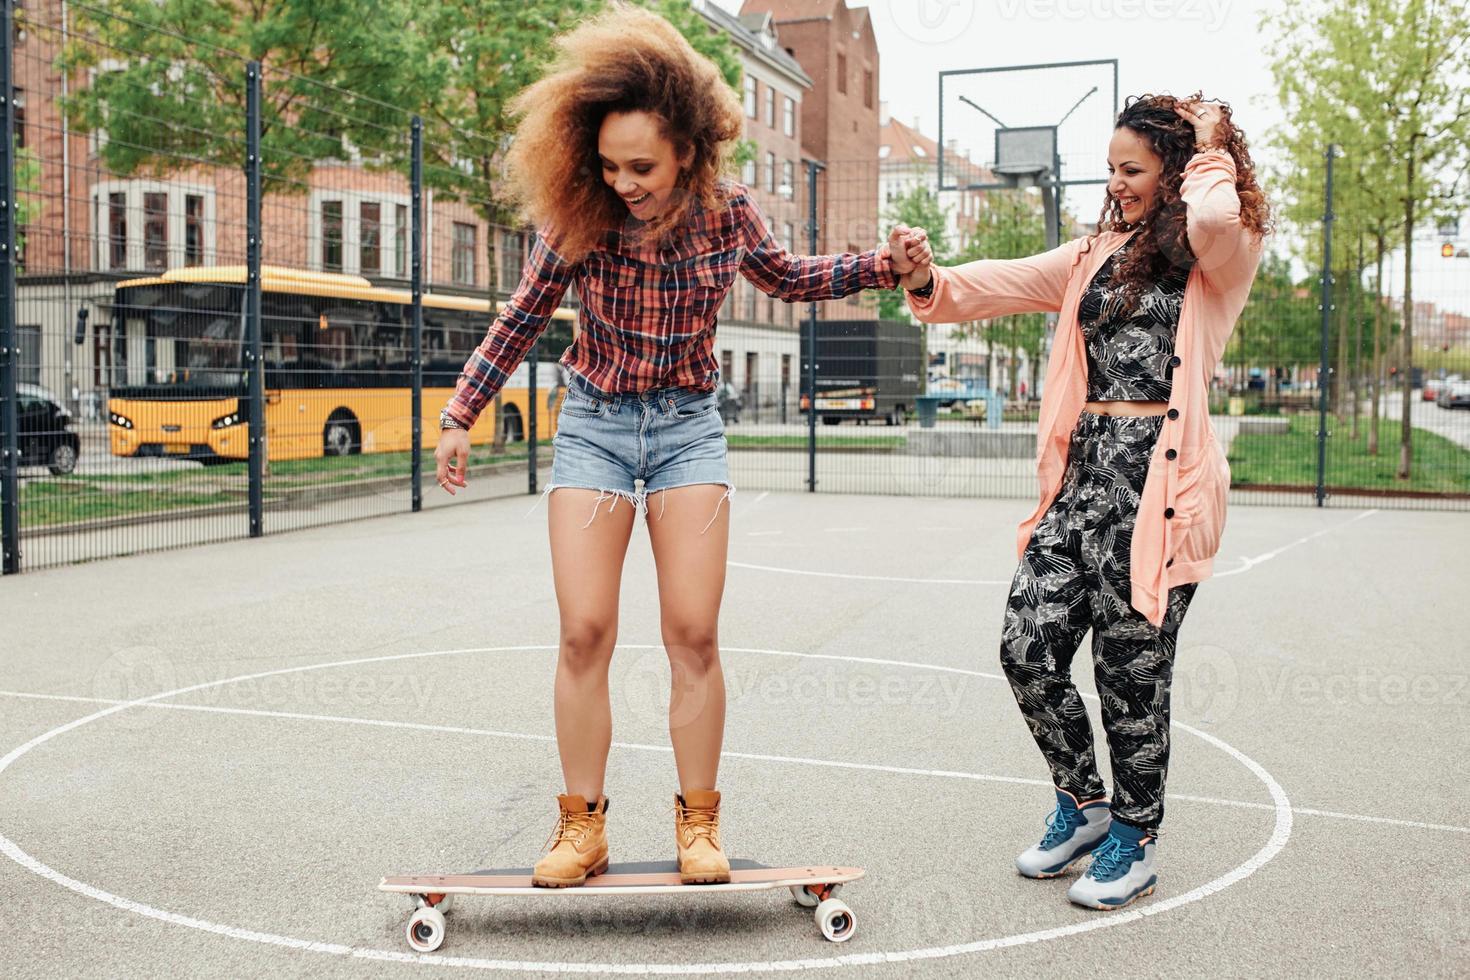 Frau lernt Skateboard fahren foto